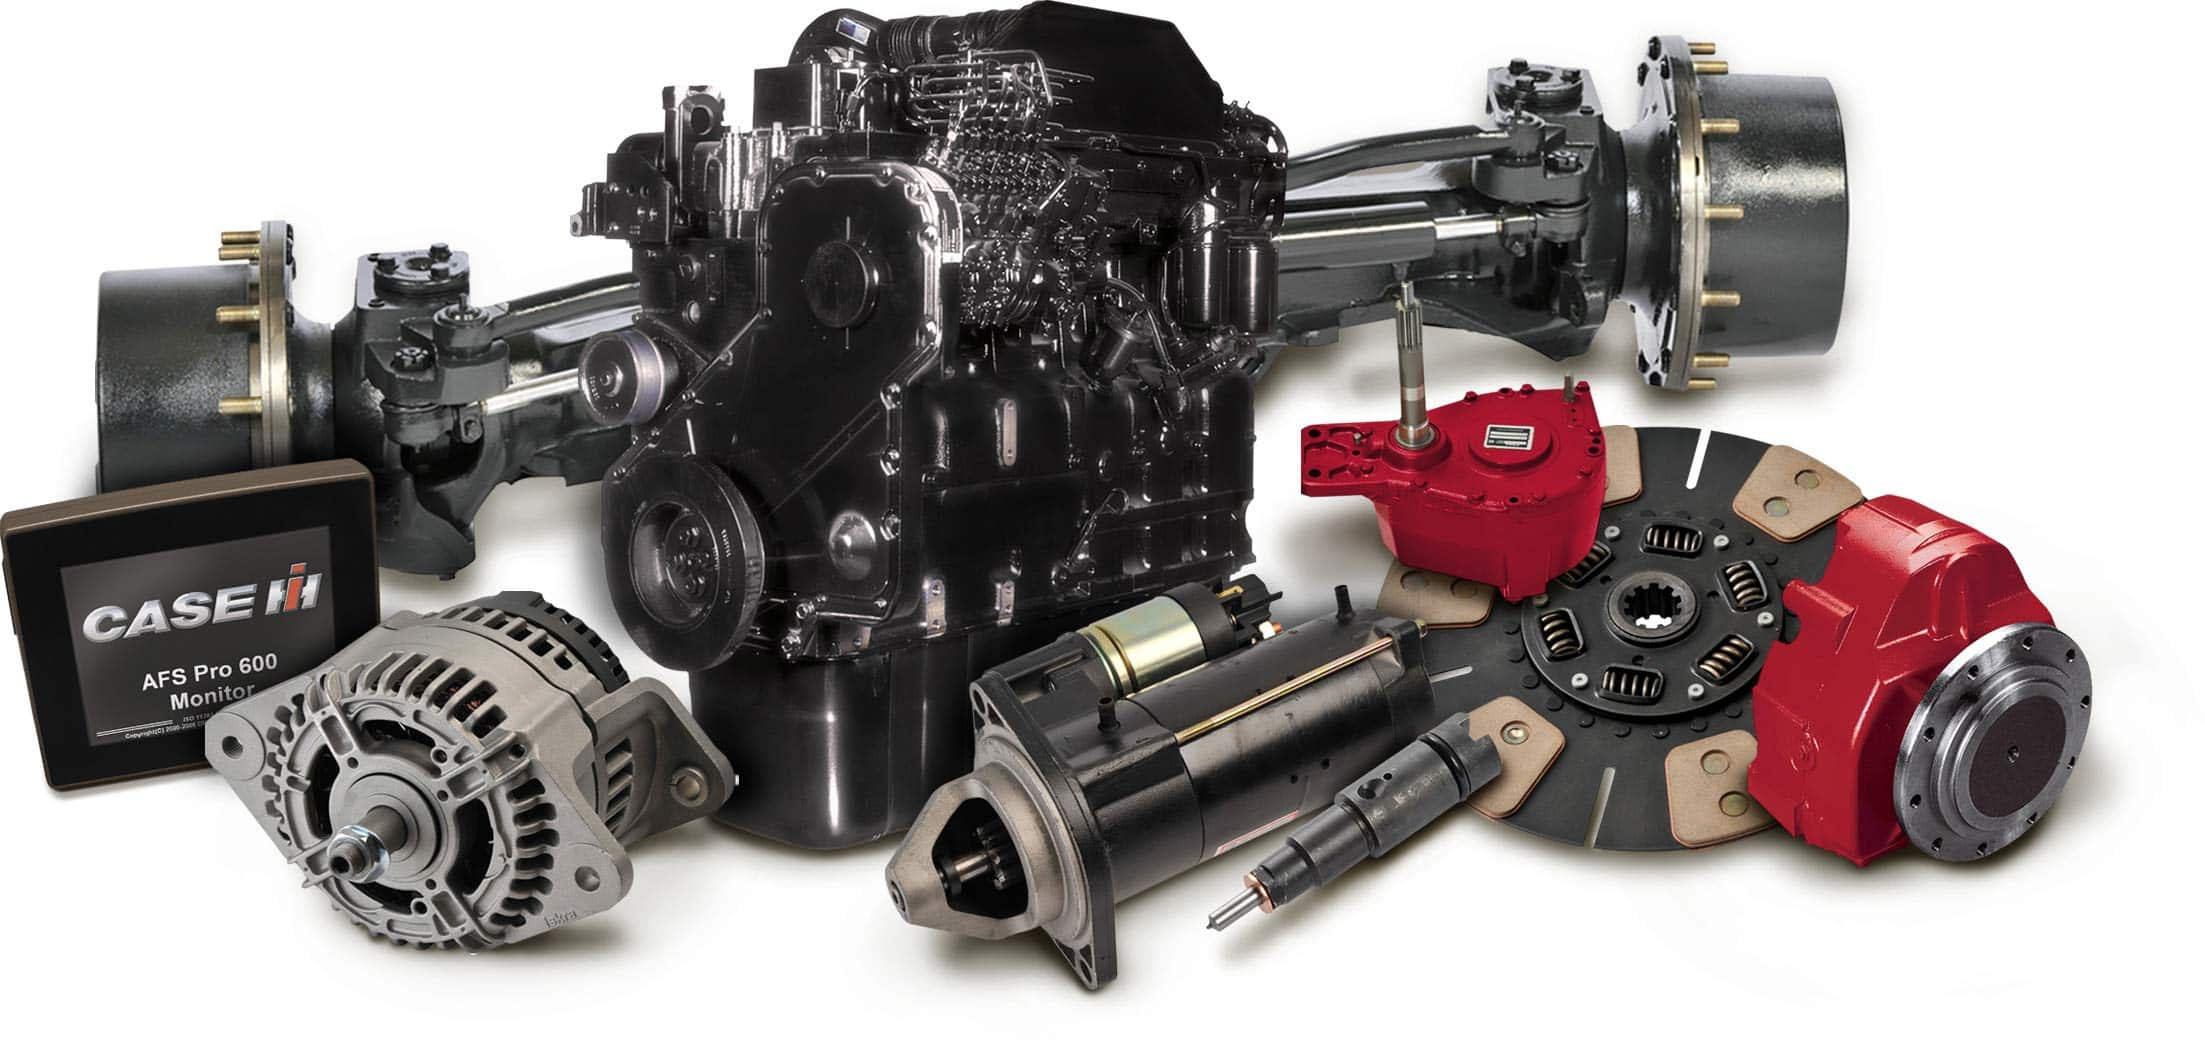 Ih 784 Wiring Diagram Great Design Of 1586 Electrical Diagrams 2001 International Truck Acdelco Alternator